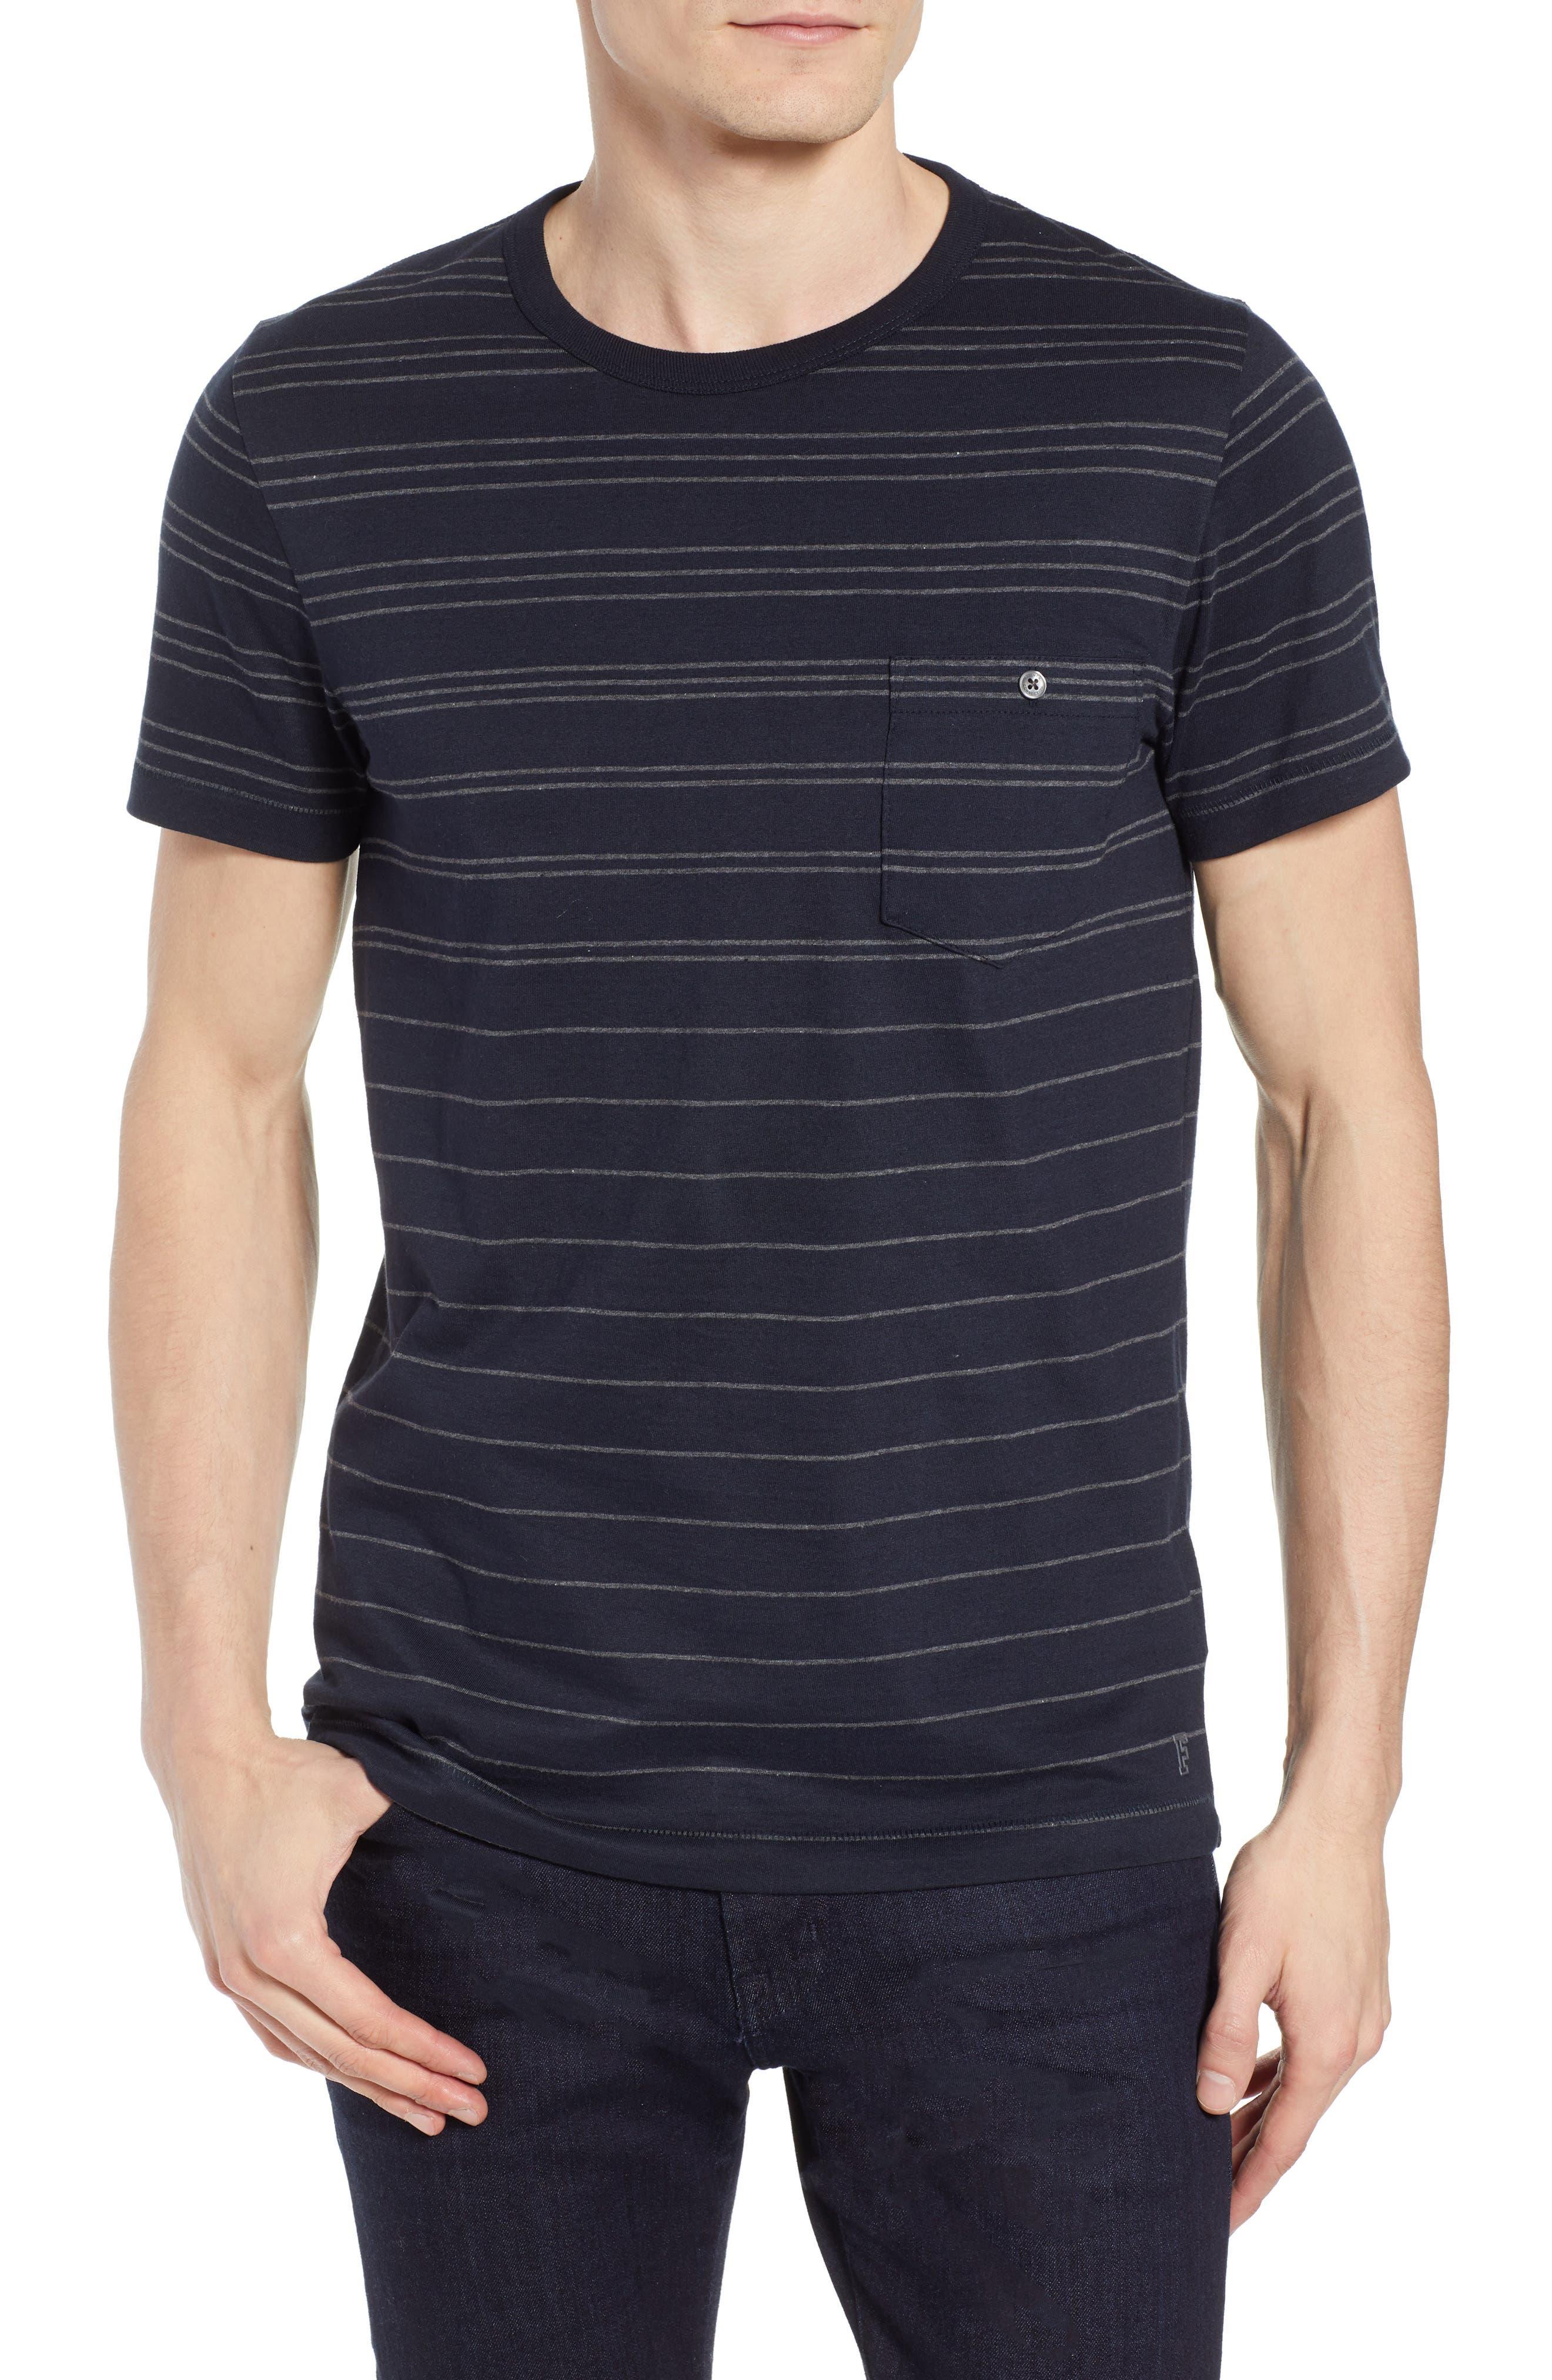 Summer Graded Stripe Pocket T-Shirt,                             Main thumbnail 1, color,                             Marine Blue Charcoal Melange